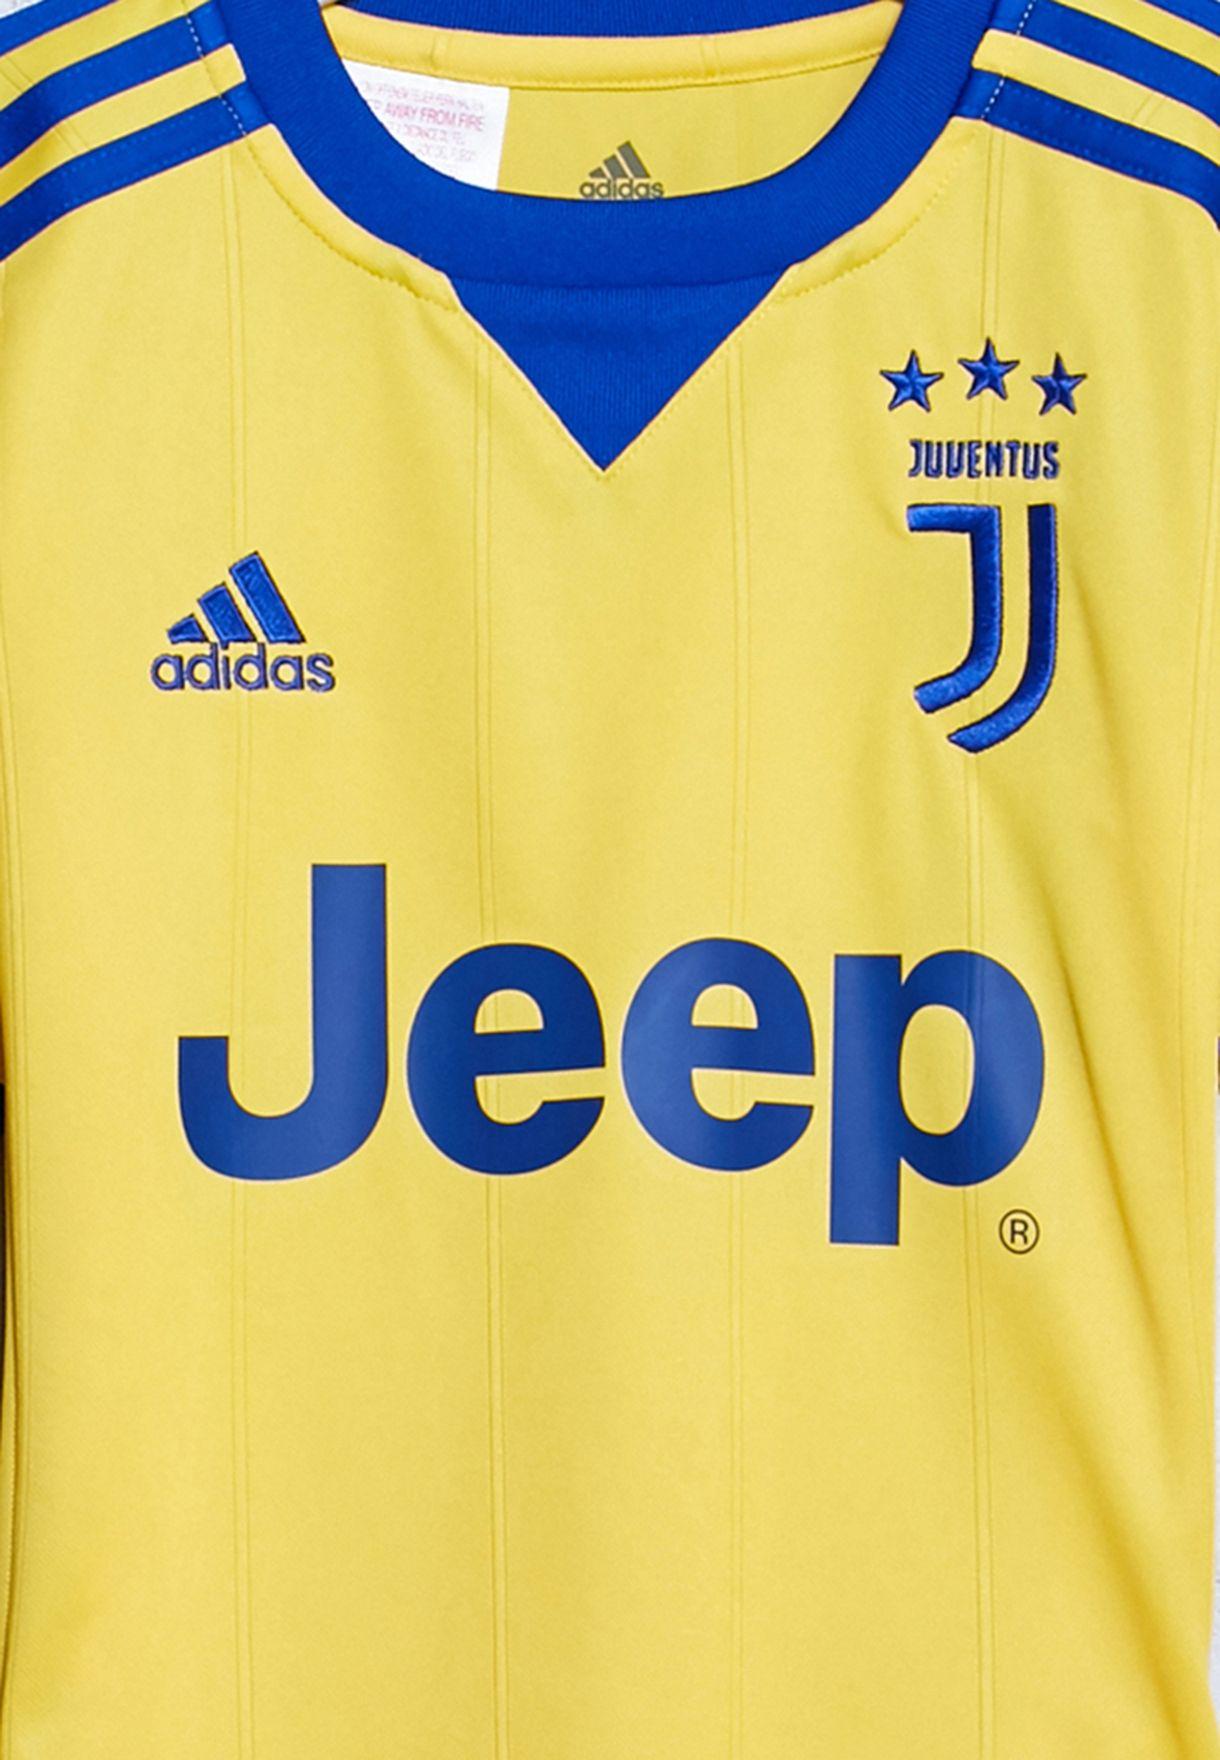 31a7efc2b Shop adidas yellow Youth Juventus Away Jersey AZ8690 for Kids in UAE ...